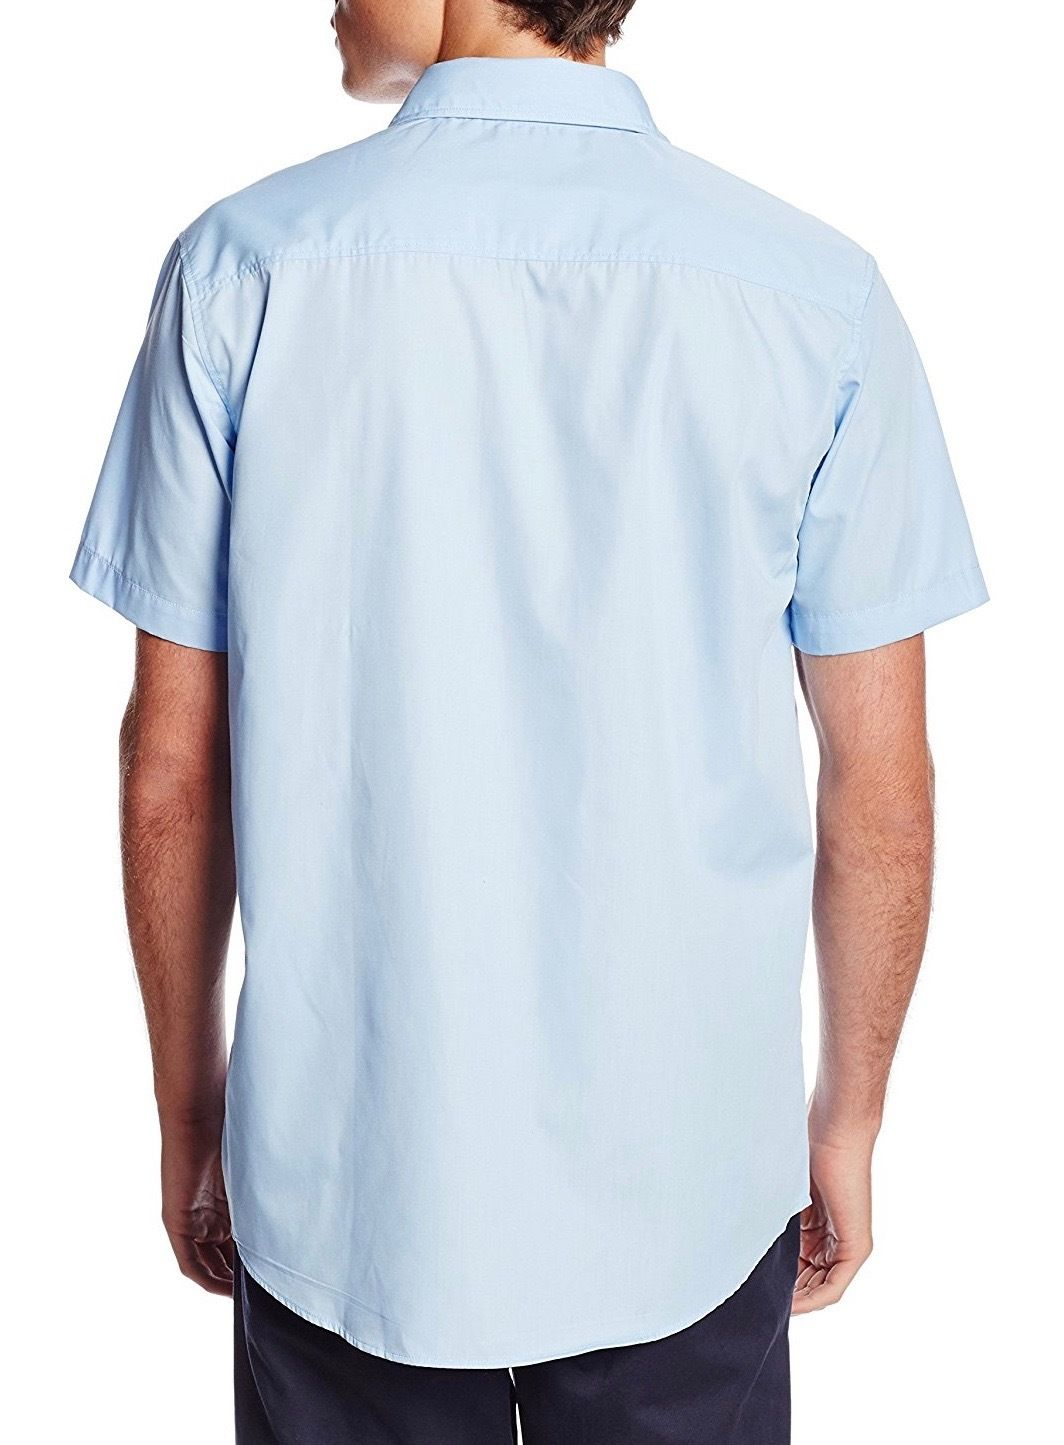 Berlioni-Italy-Men-039-s-Premium-Classic-Button-Down-Short-Sleeve-Solid-Dress-Shirt thumbnail 7